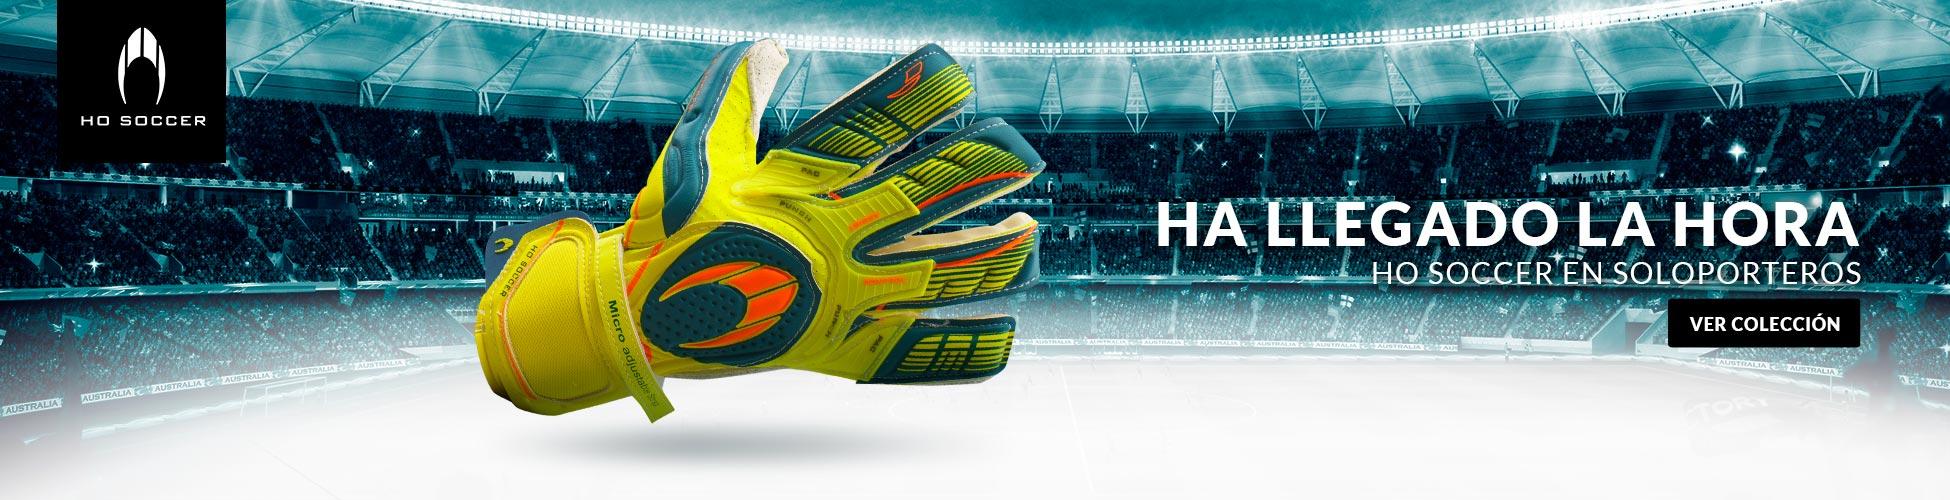 HO soccer ES